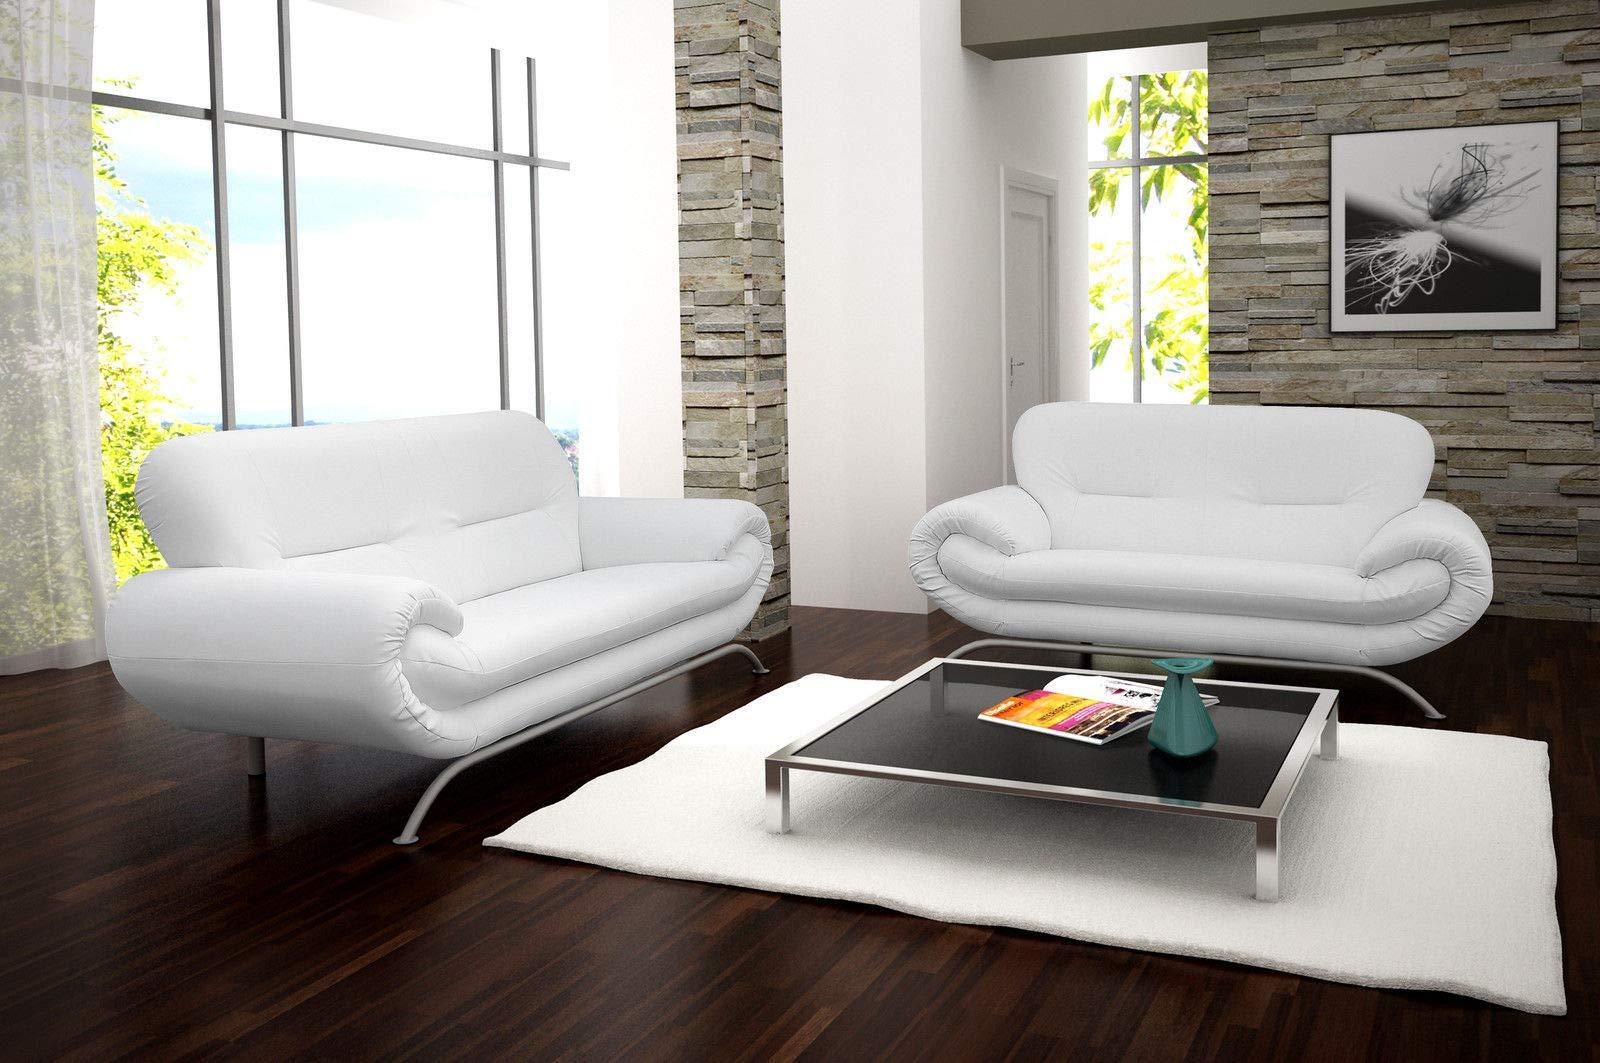 Sofa Honeypot Black 3 Seater 3 Seater, Black 2 Seater White Nina 3/&2 Seater